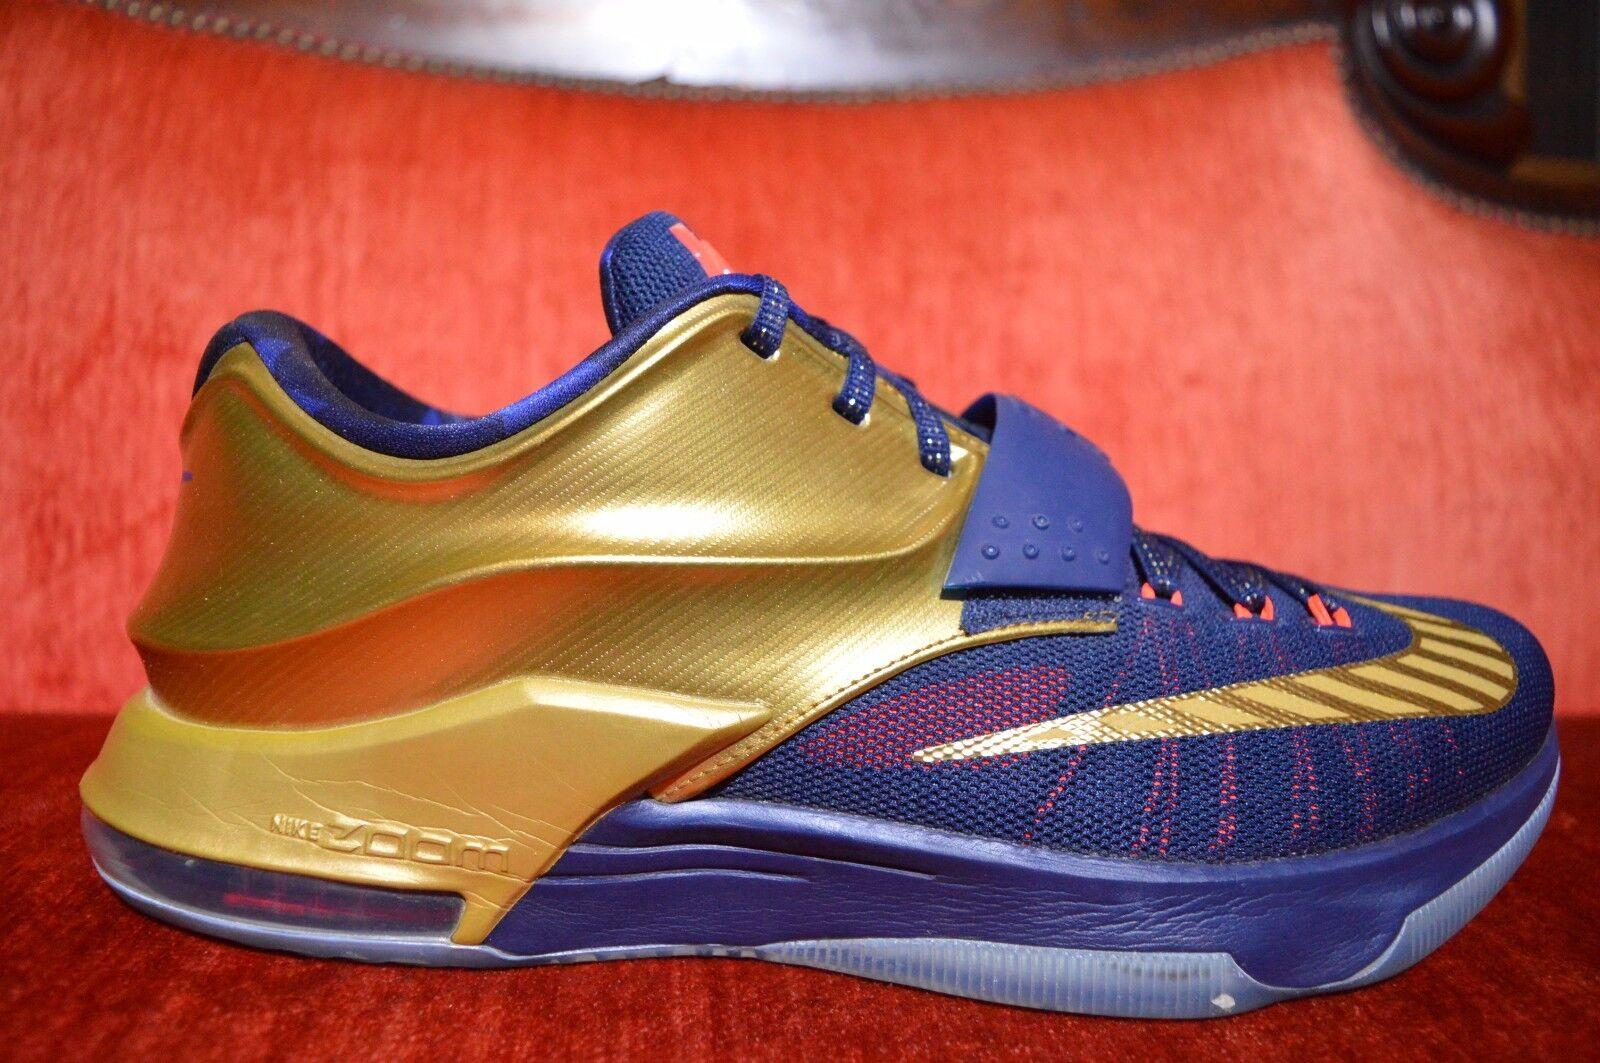 487f63bdfe7c CLEAN Nike KD 7 VII PRM Gold Gold Gold Medal Size 12 706858 476 jordan bhm